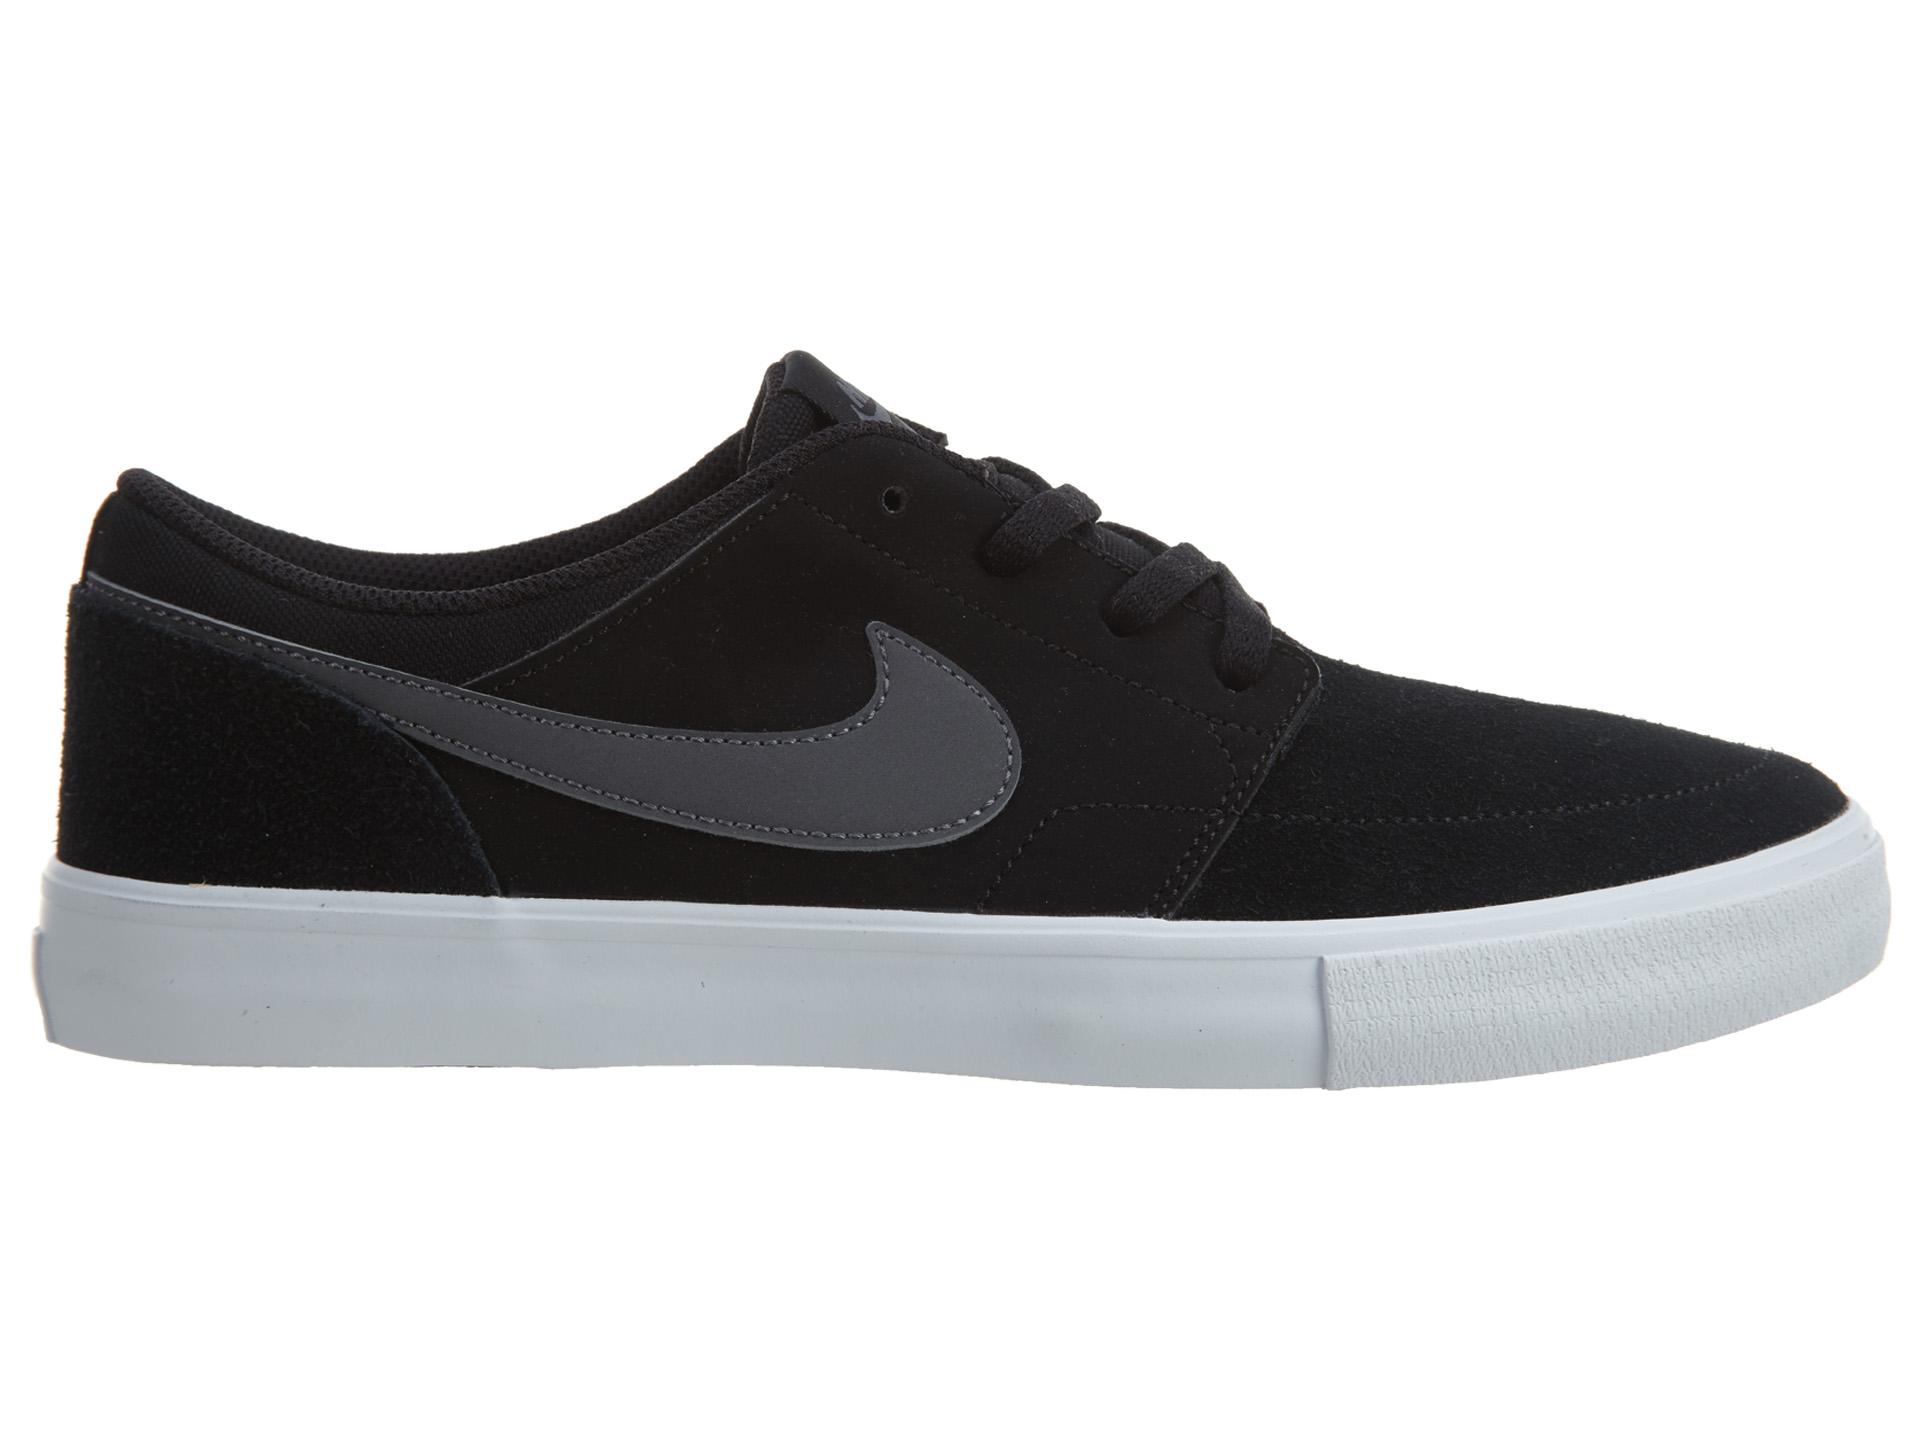 Nike Sb Portmore Ii Solar Black/Dark